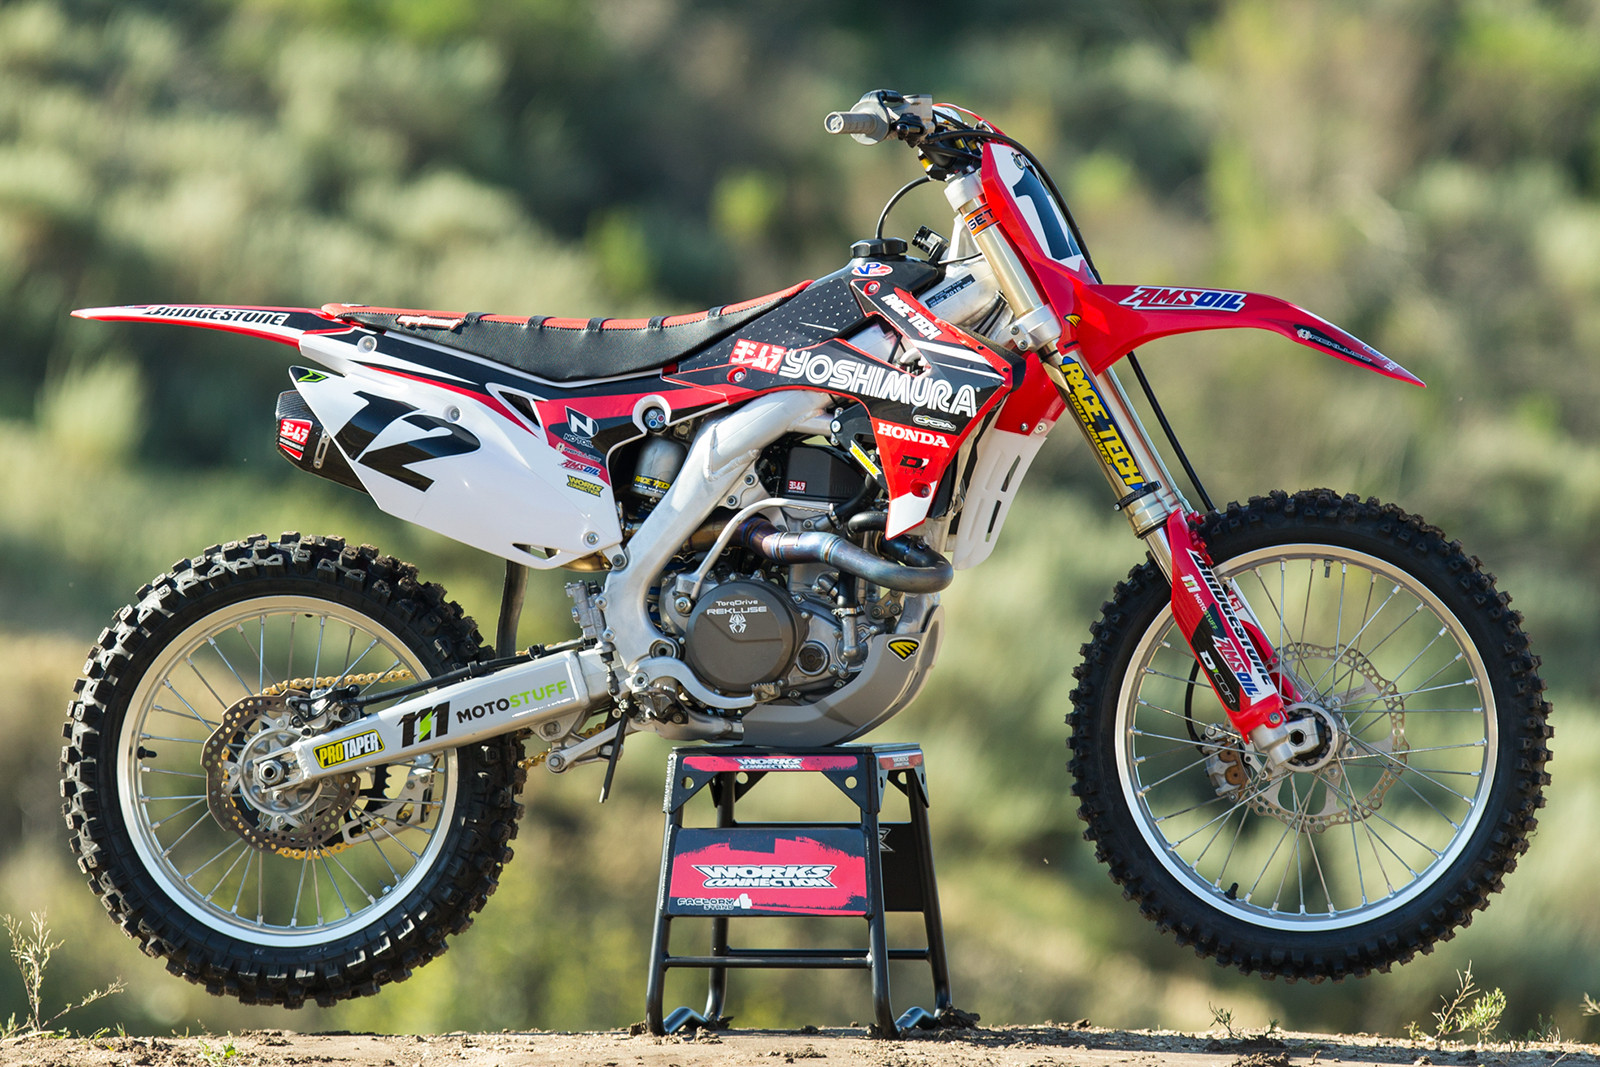 Tested 2015 Honda CRF450R Project Bike 4